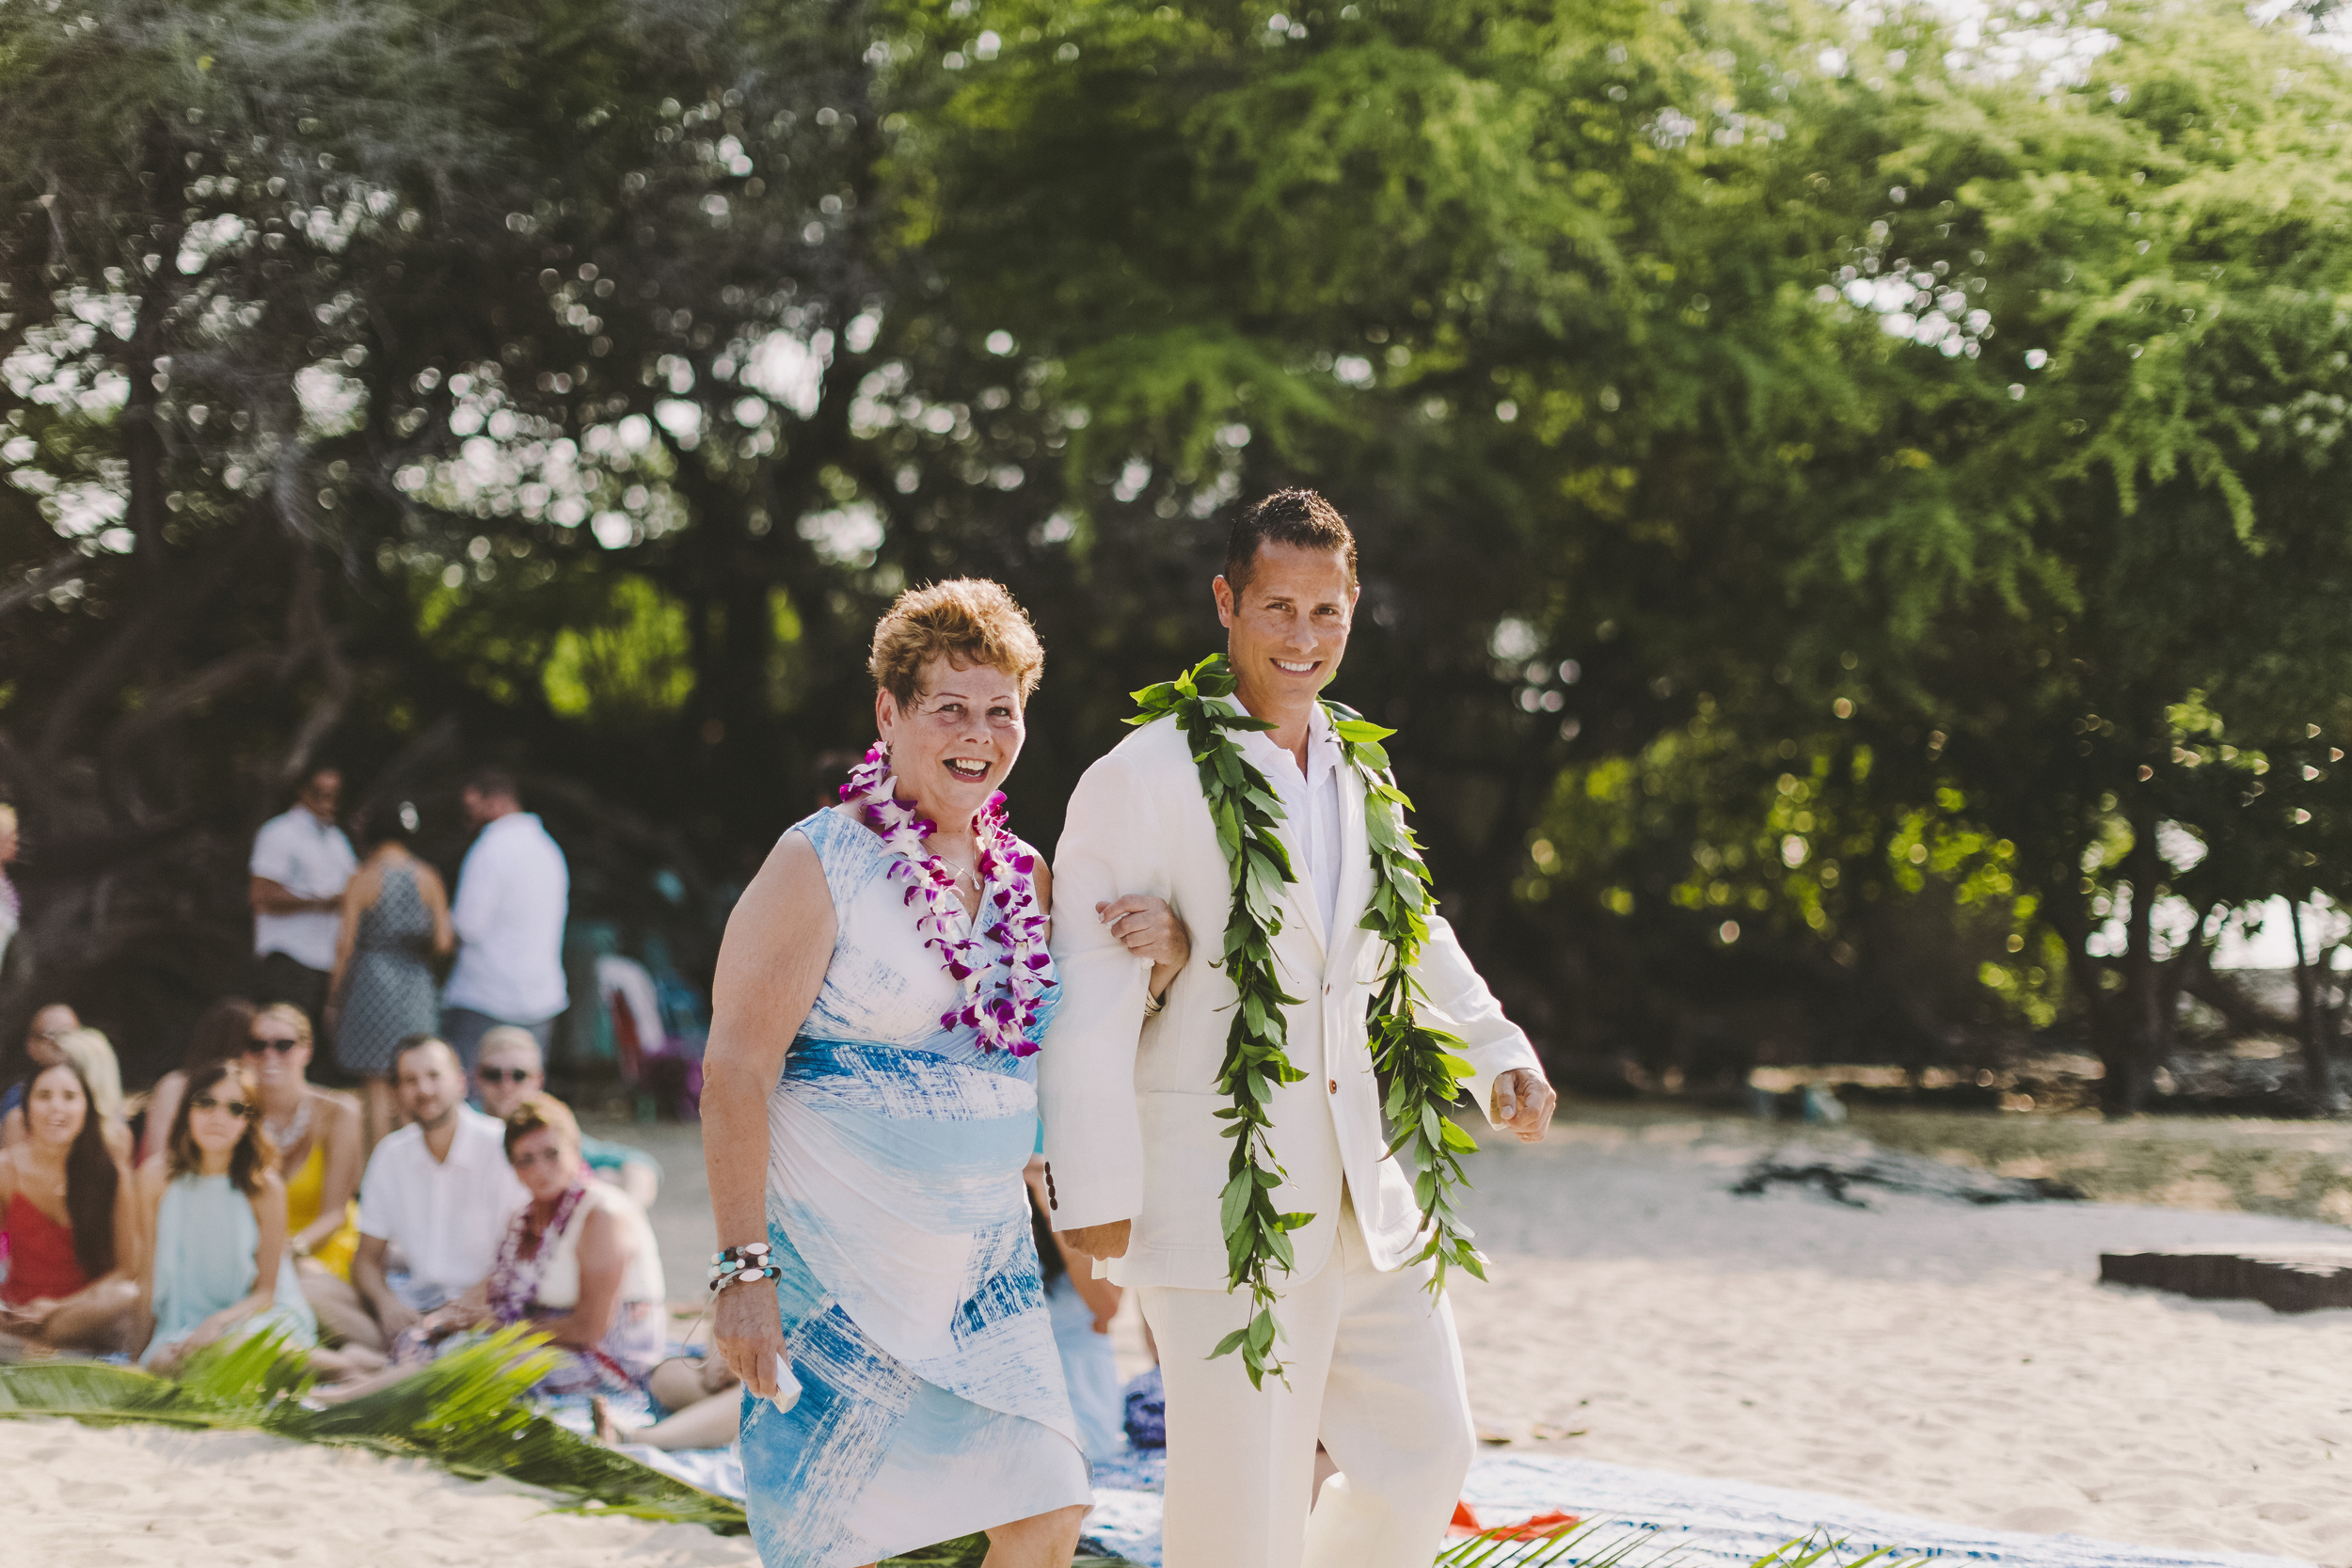 angie-diaz-photography-hawaii-wedding-photographer-kelli-jay-44.jpg